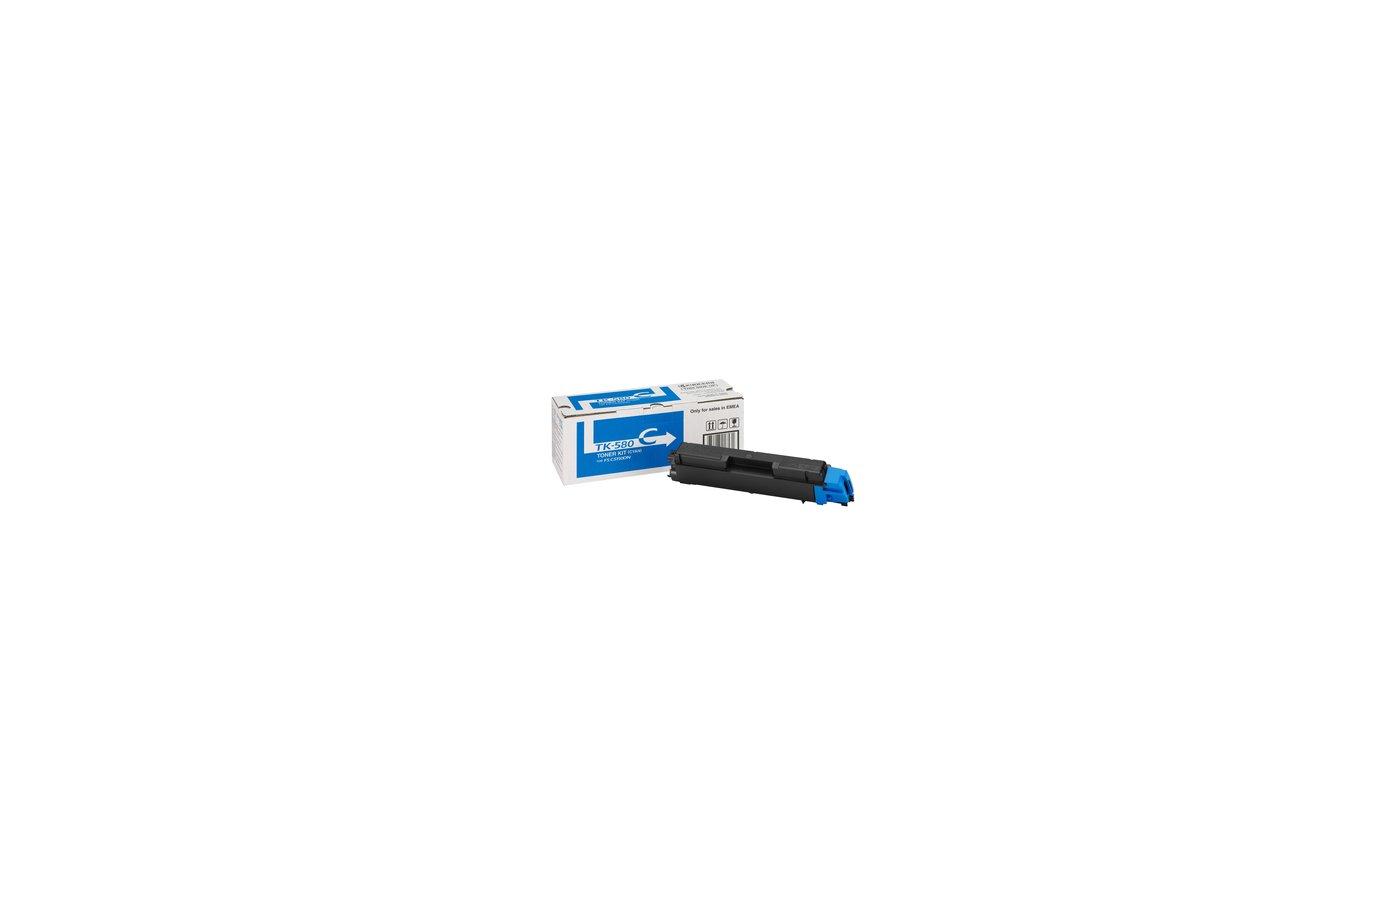 Картридж лазерный Kyocera TK-580C голубой, для FS-C5150DN (2 800 стр) 1T02KTCNL0